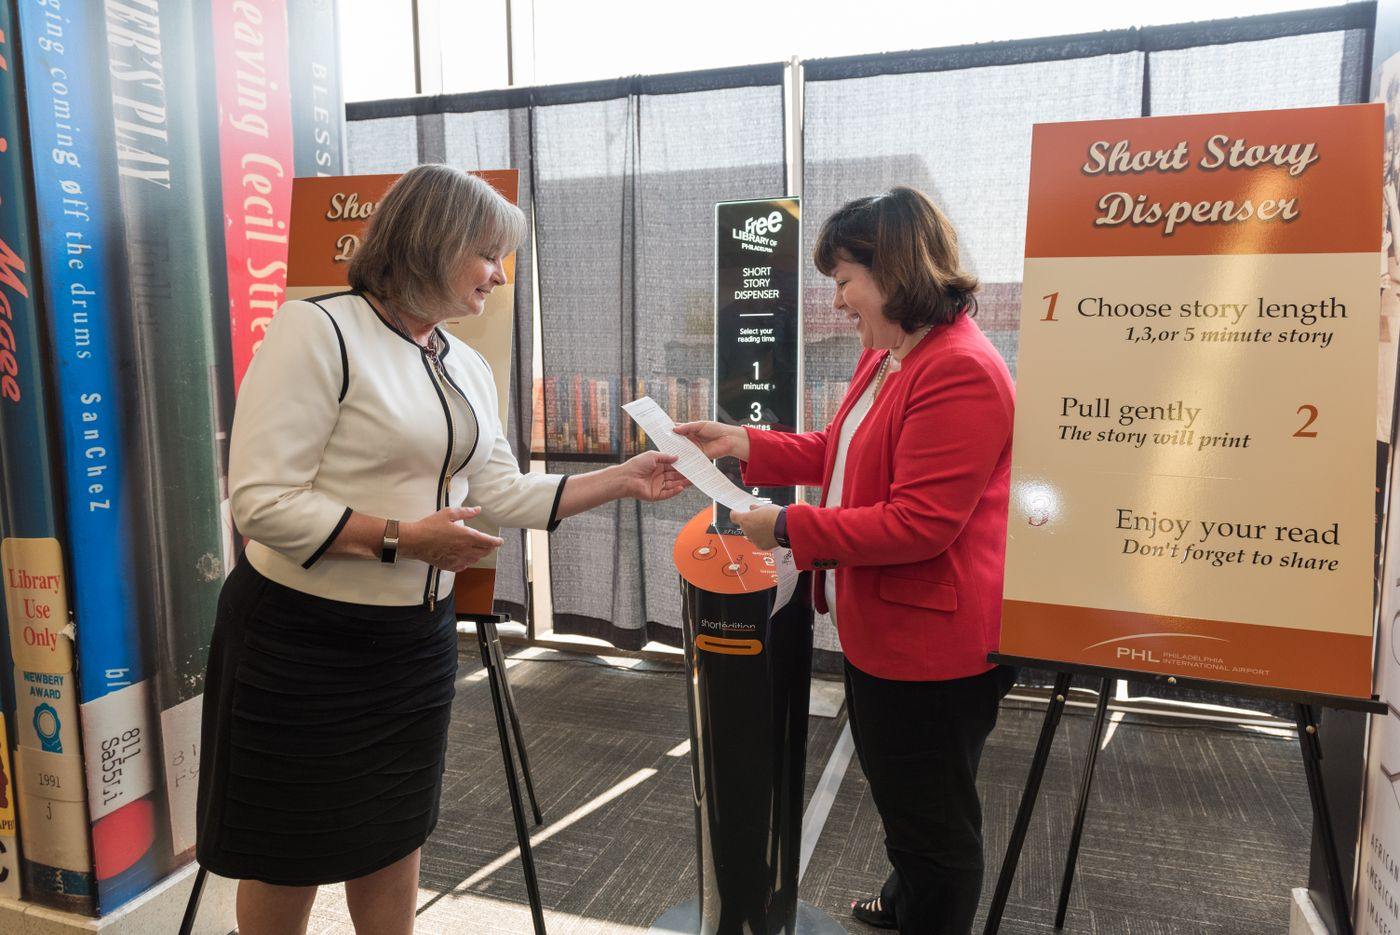 Image de [ US ] Short Story Dispenser unveiled at Philadelphia International Airport